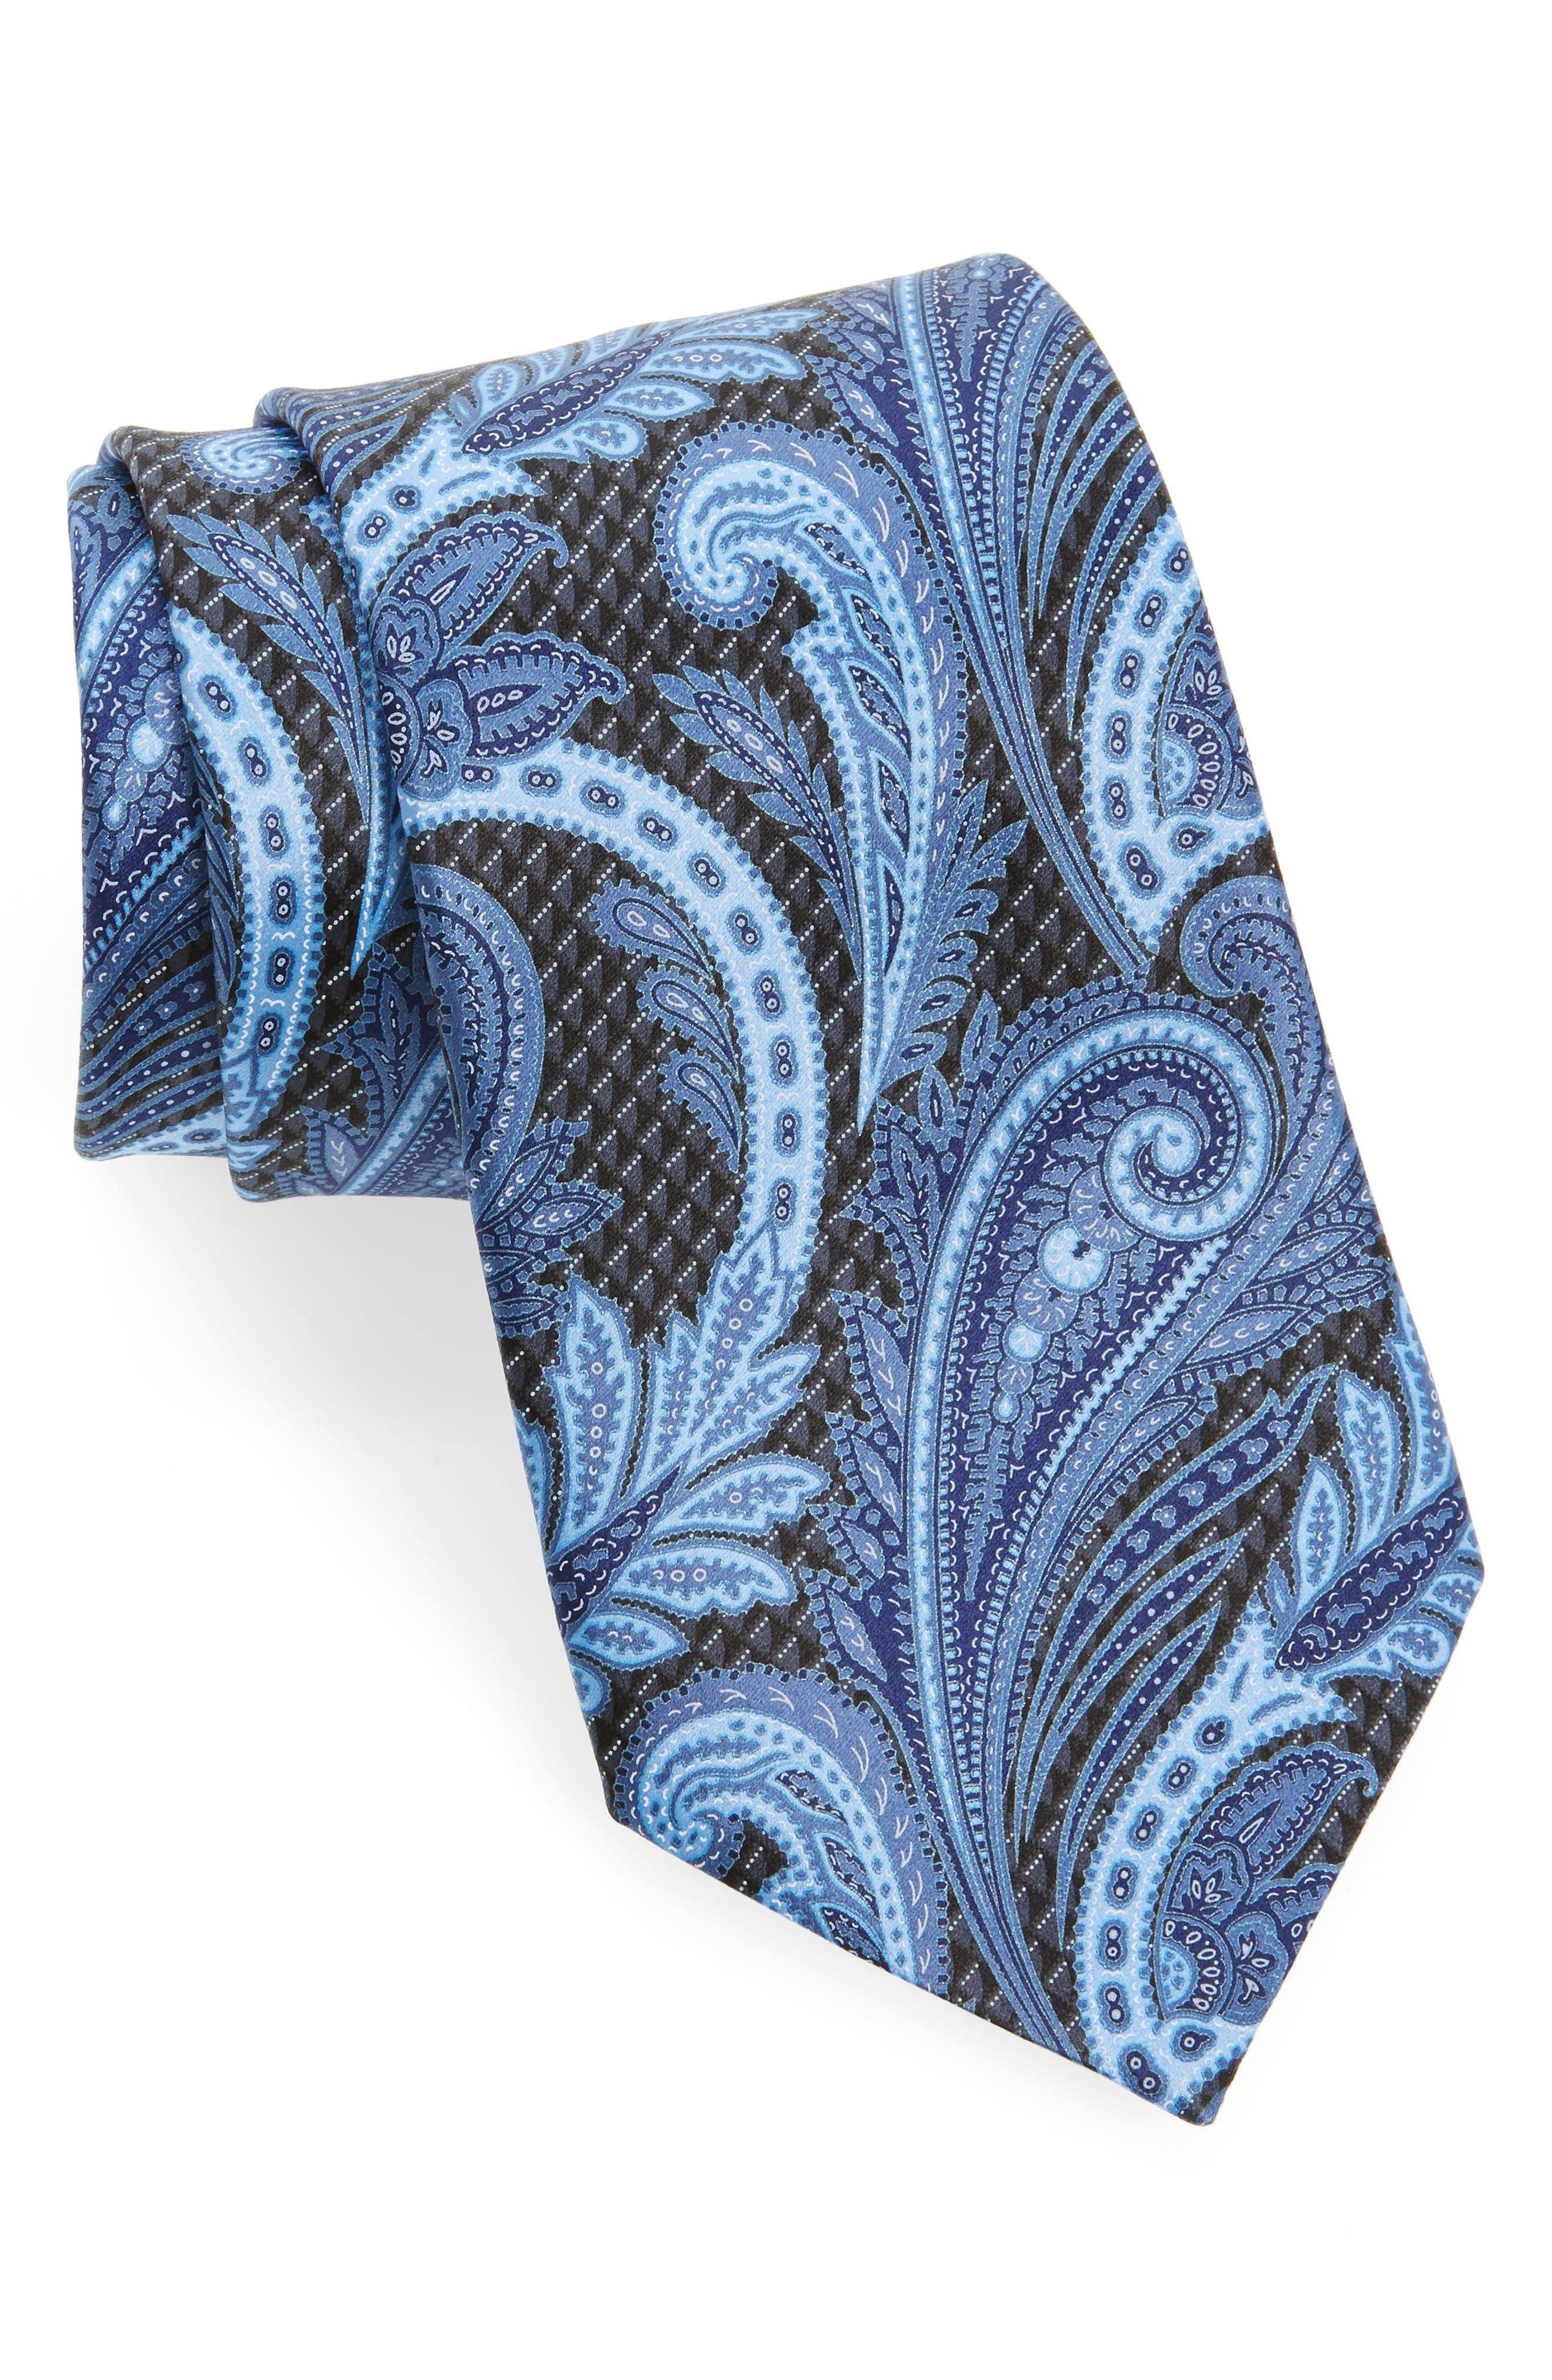 ERMENEGILDO ZEGNA Paisley Floral Silk Tie